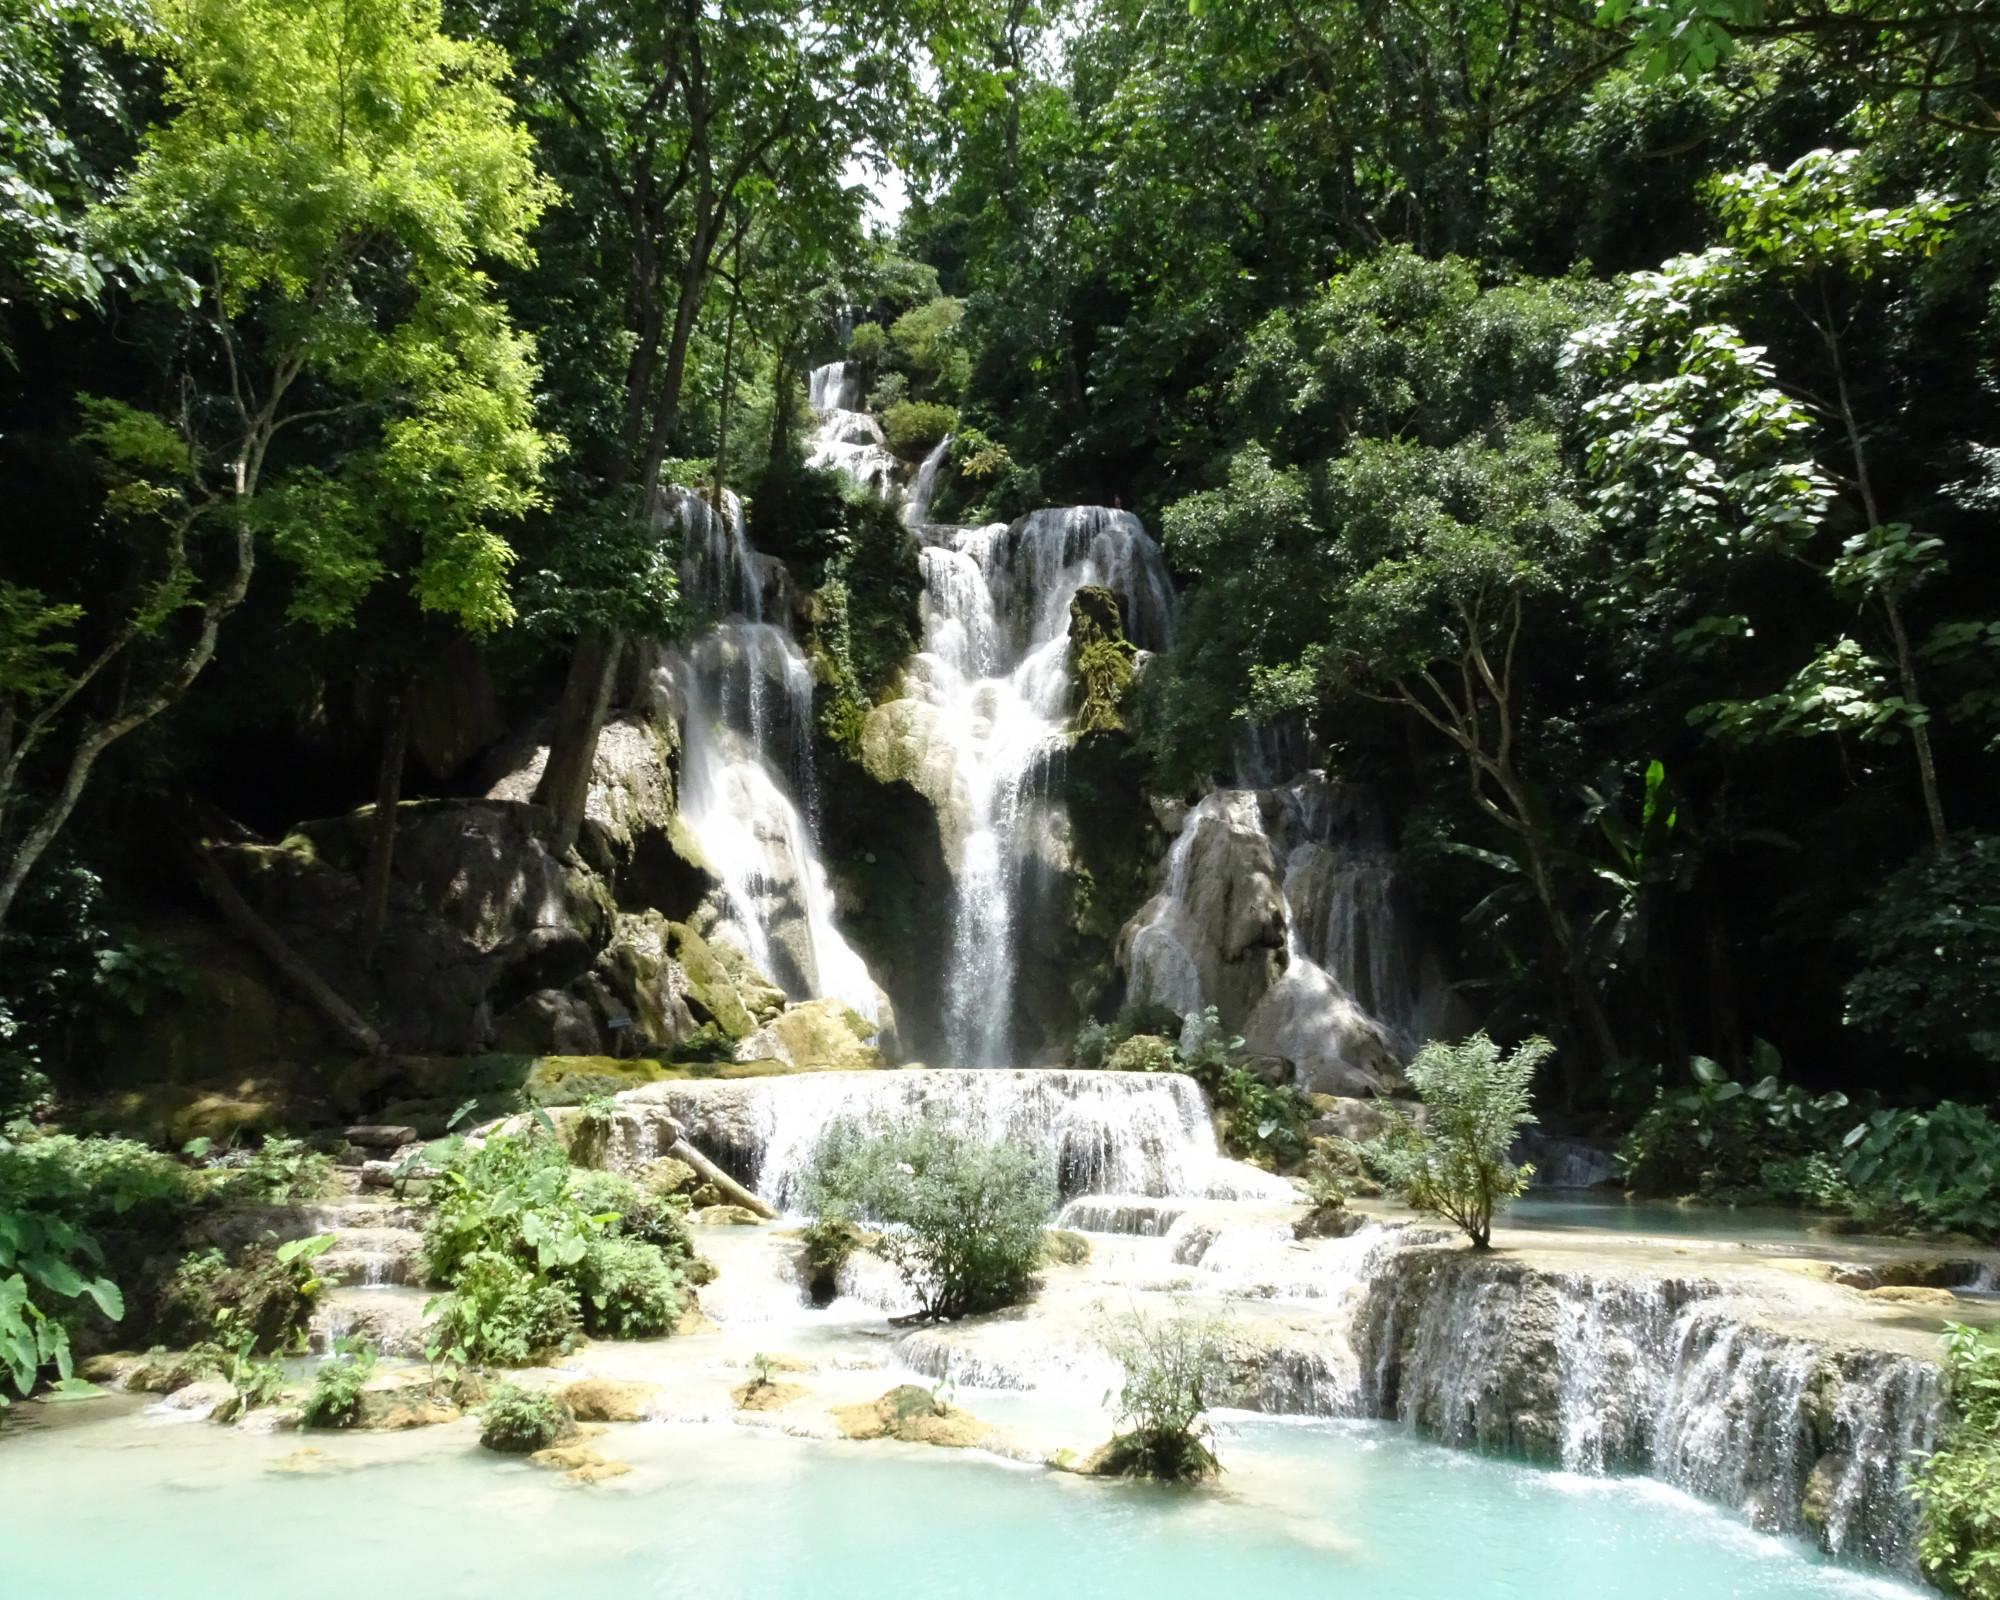 Photo 1: Kuang Si falls, irréelles et somptueuses !